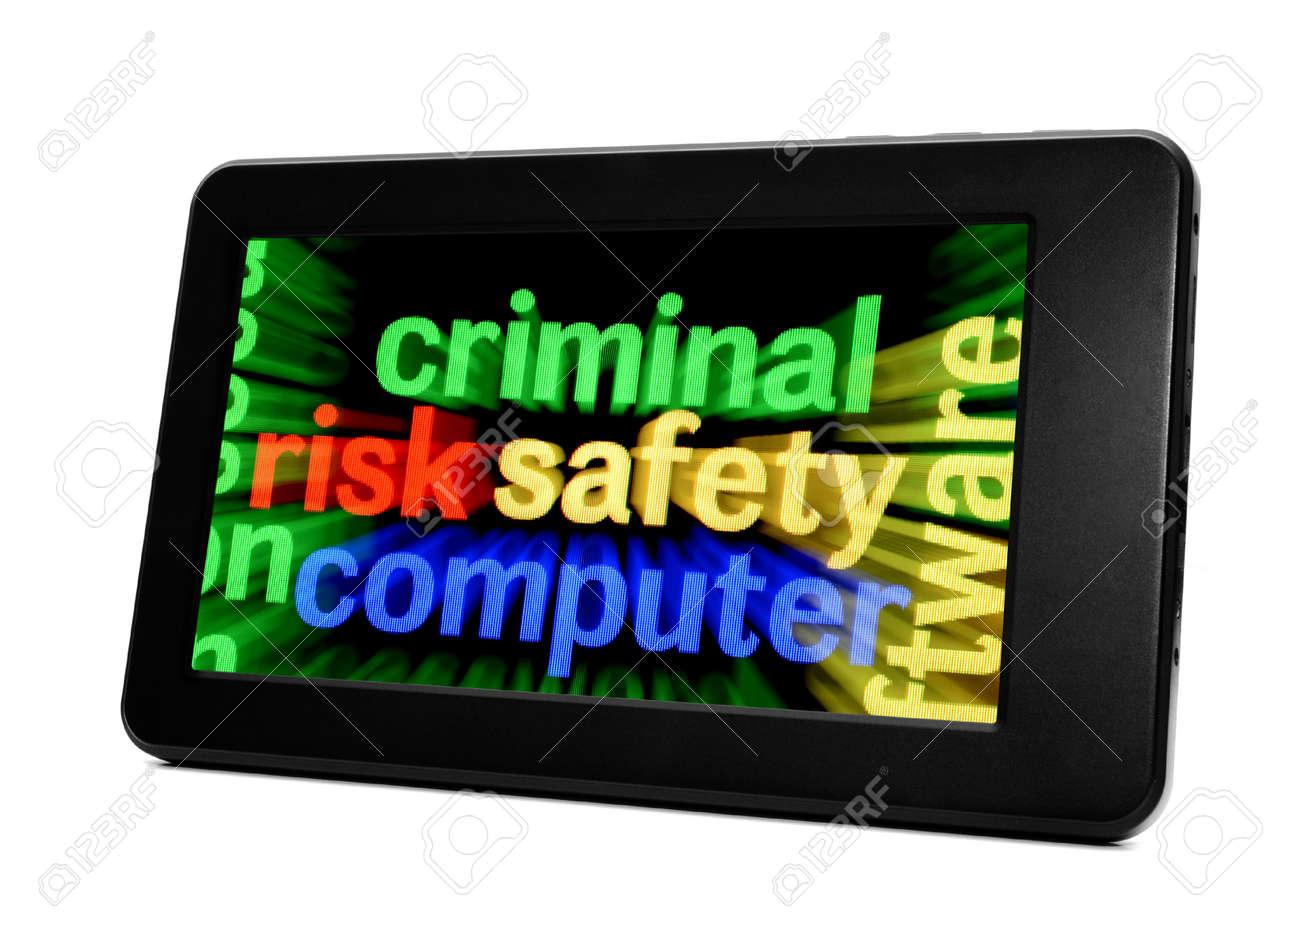 Criminal safety computer Stock Photo - 18122225